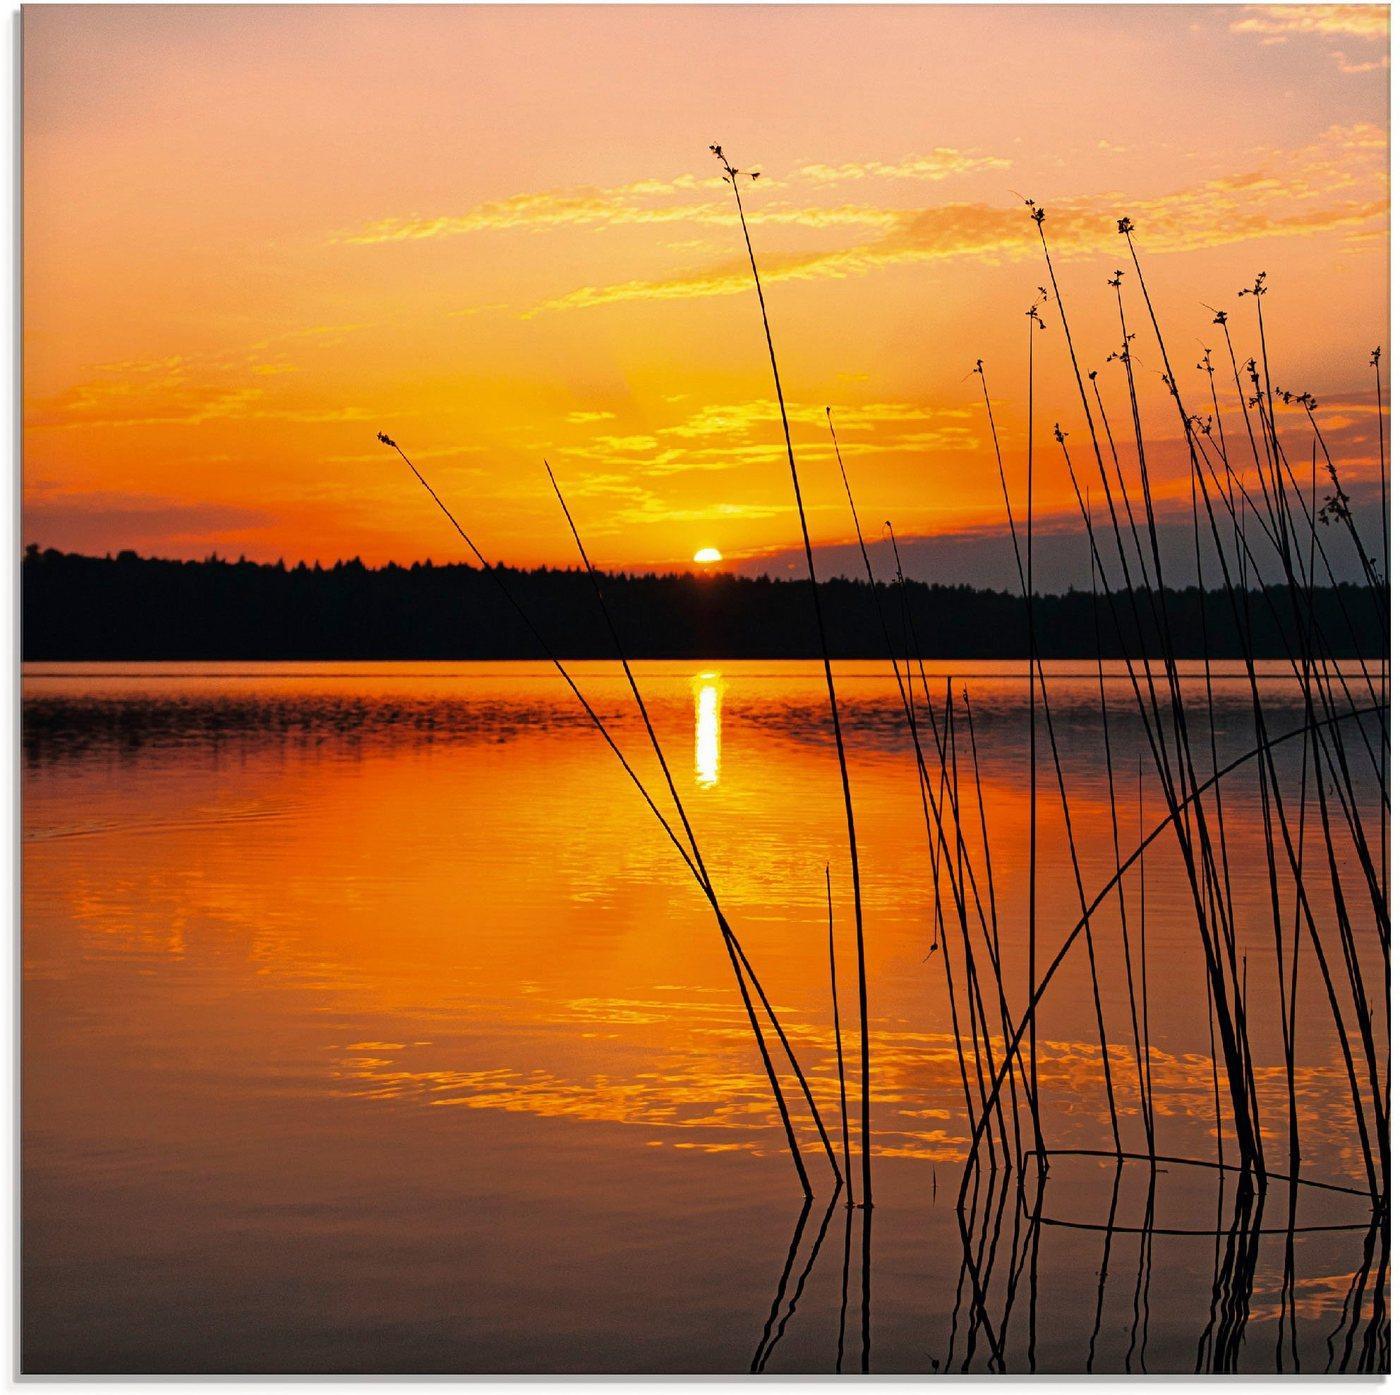 Artland Glasbild »Landschaft mit Sonnenaufgang«, Sonnenaufgang & -untergang (1 Stück)